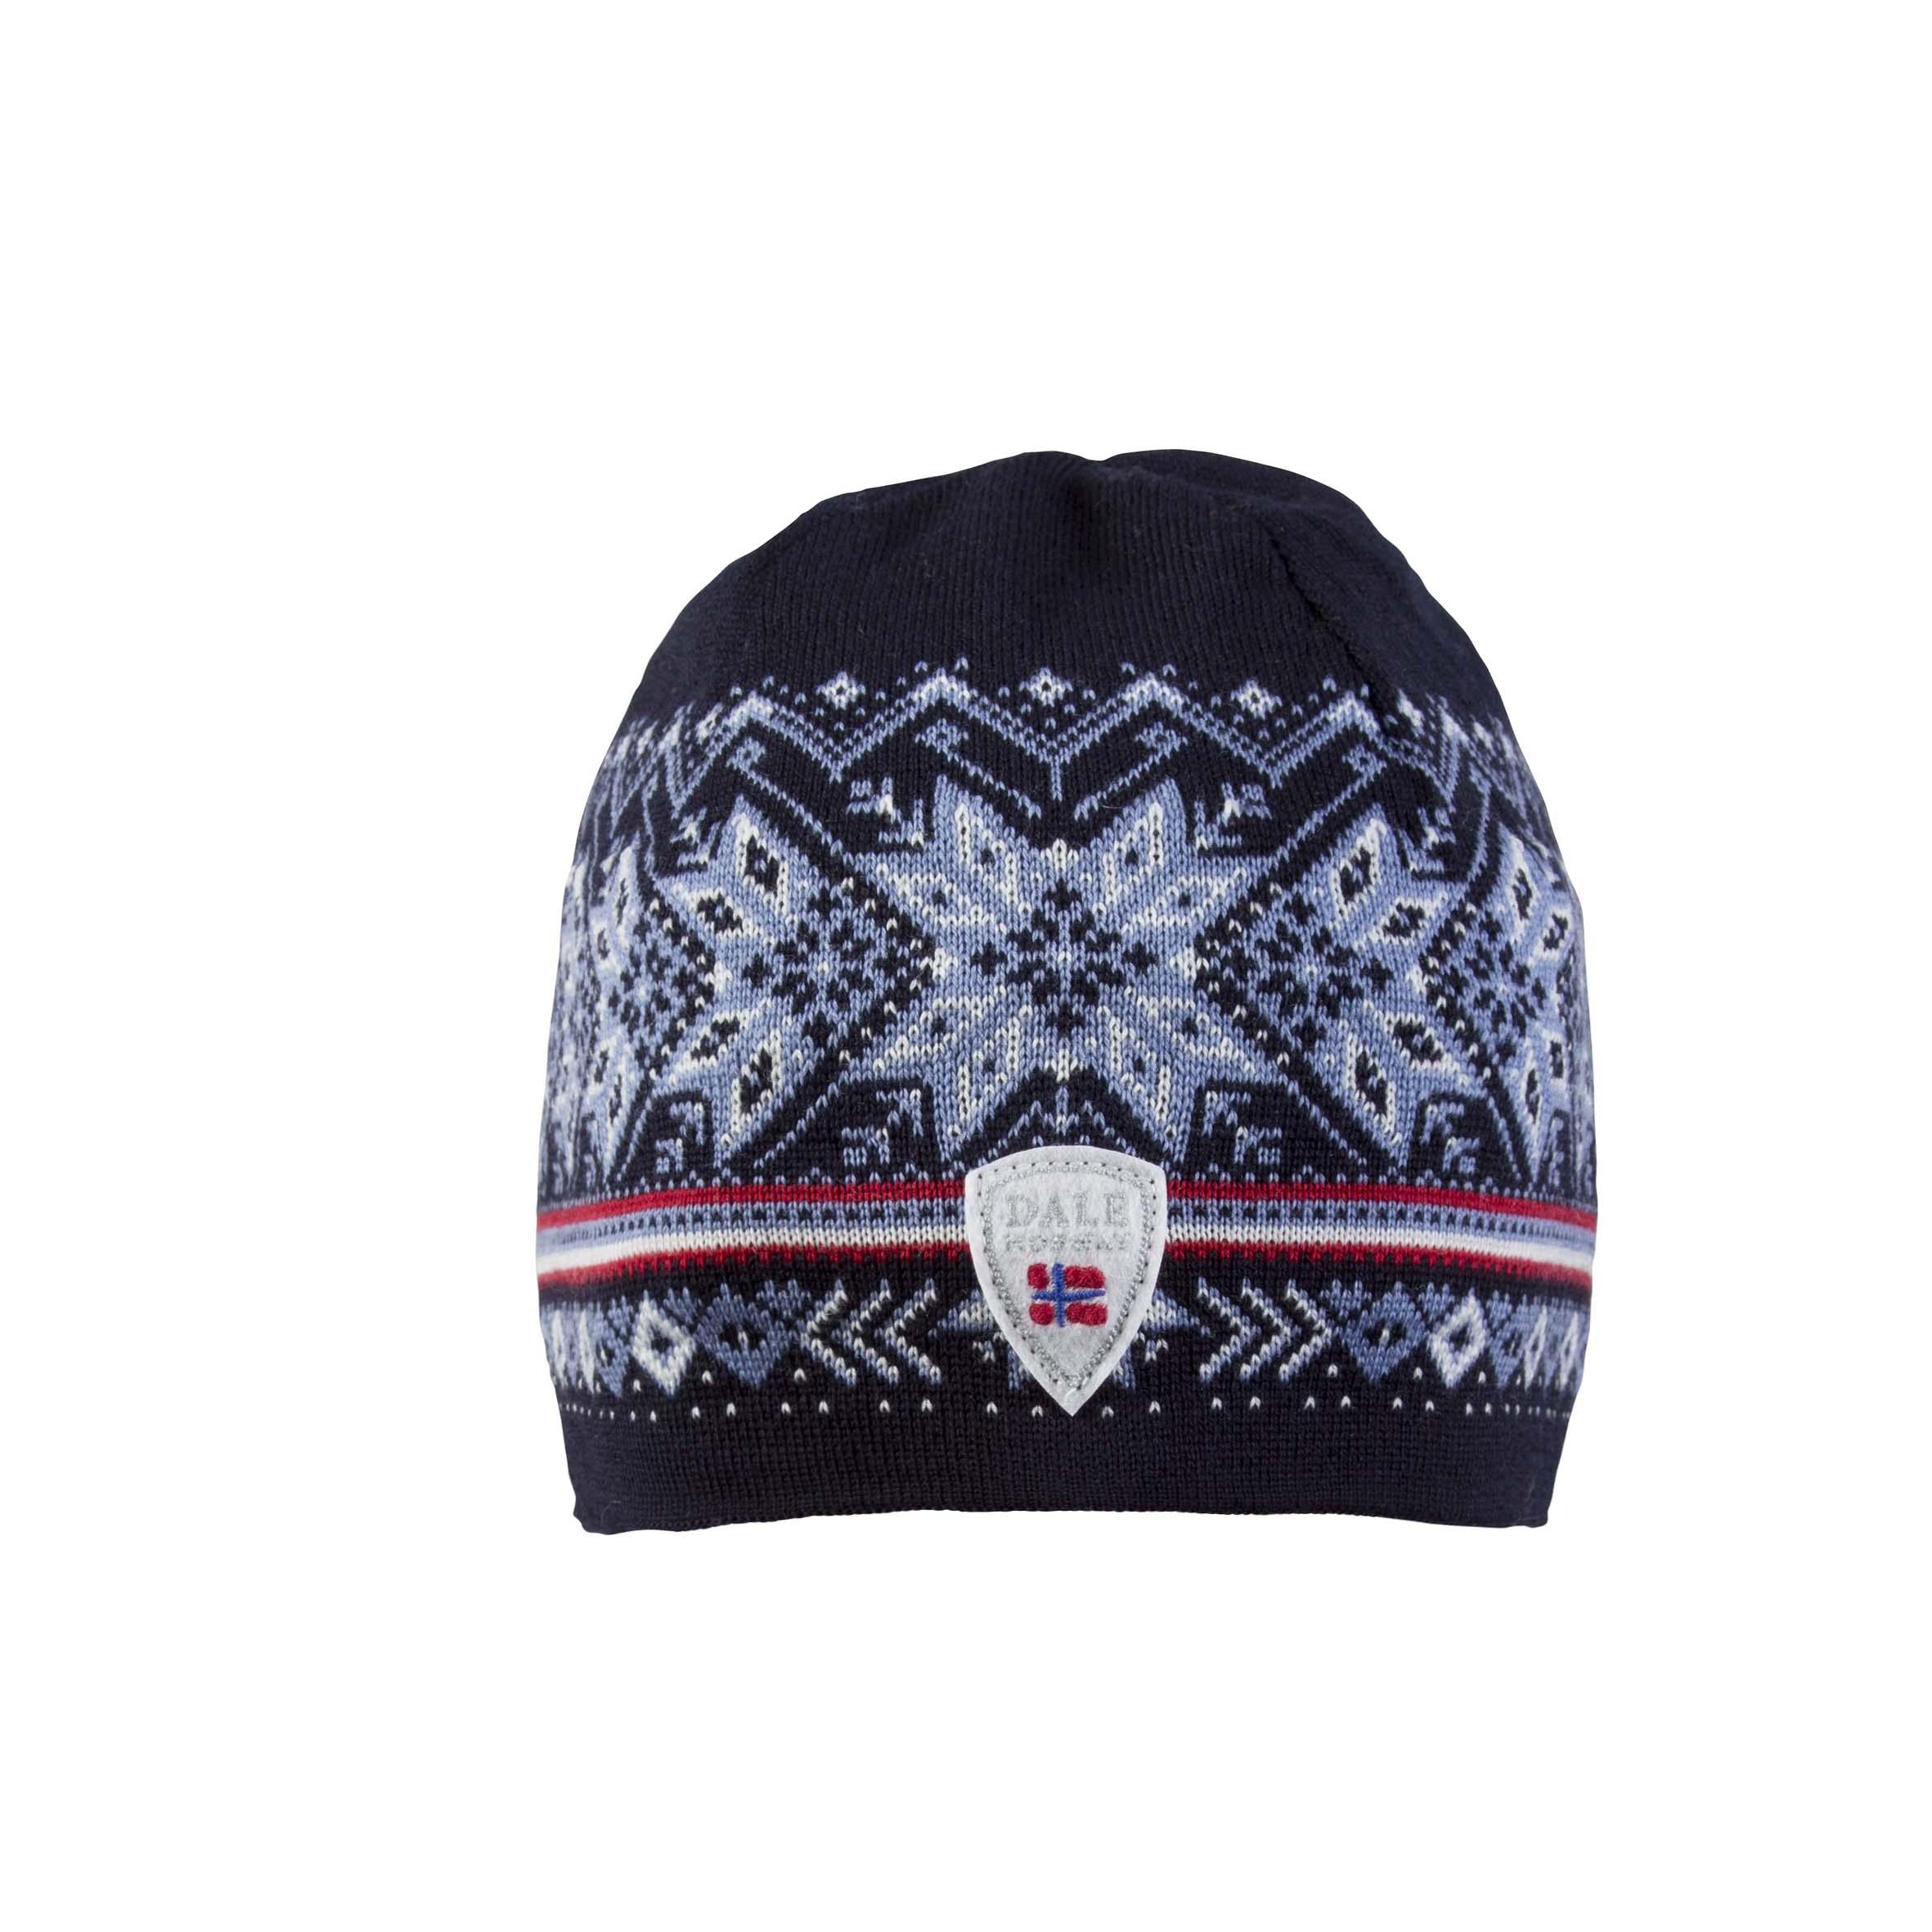 Hovden Hat (1)